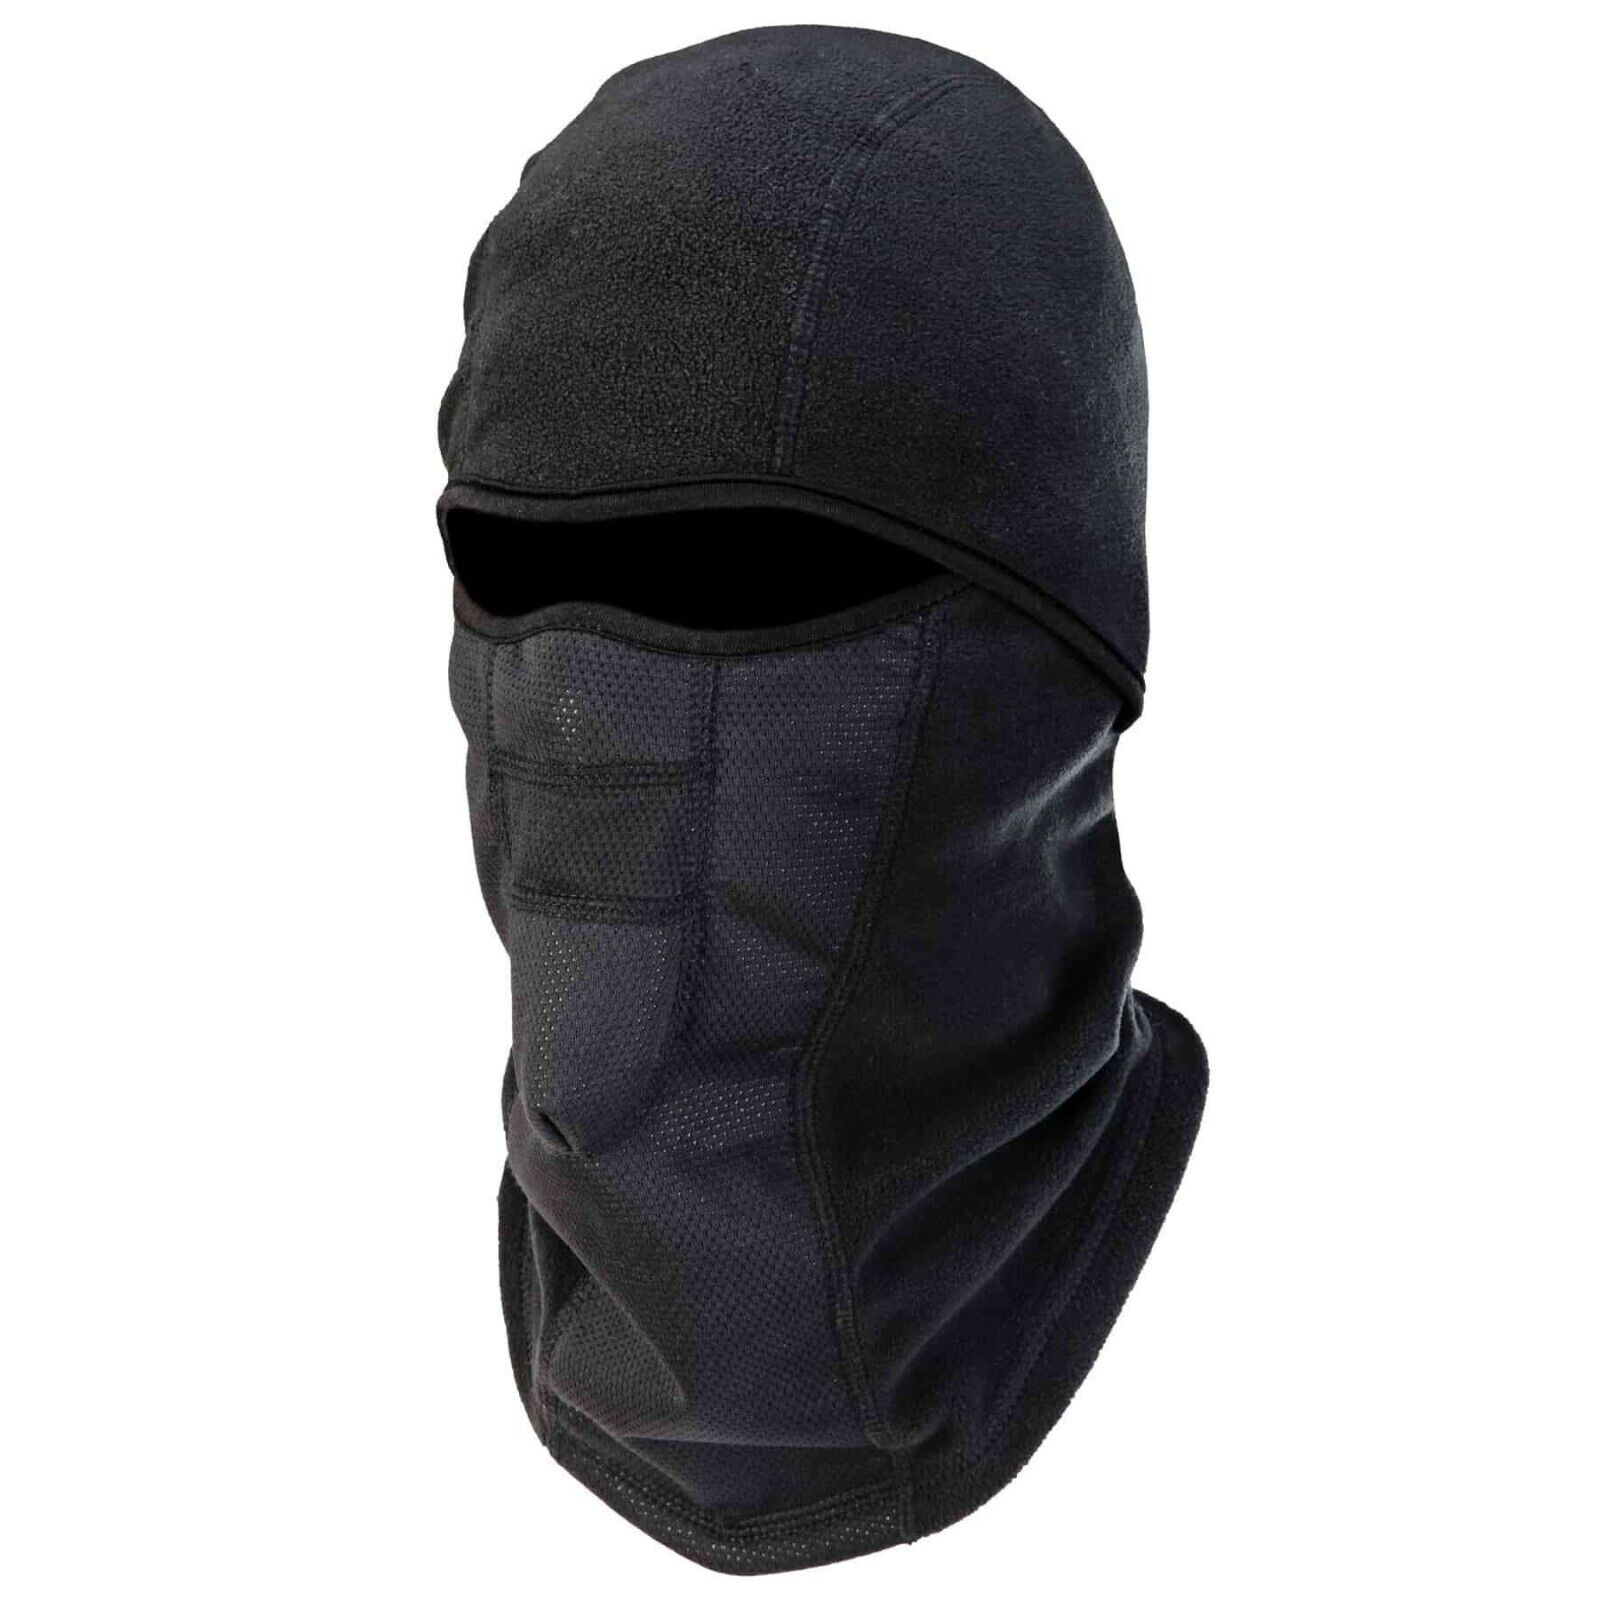 Ergodyne NFerno 6823 Black Winter Ski Mask Balaclava Wind Resistant Face Thermal Clothing